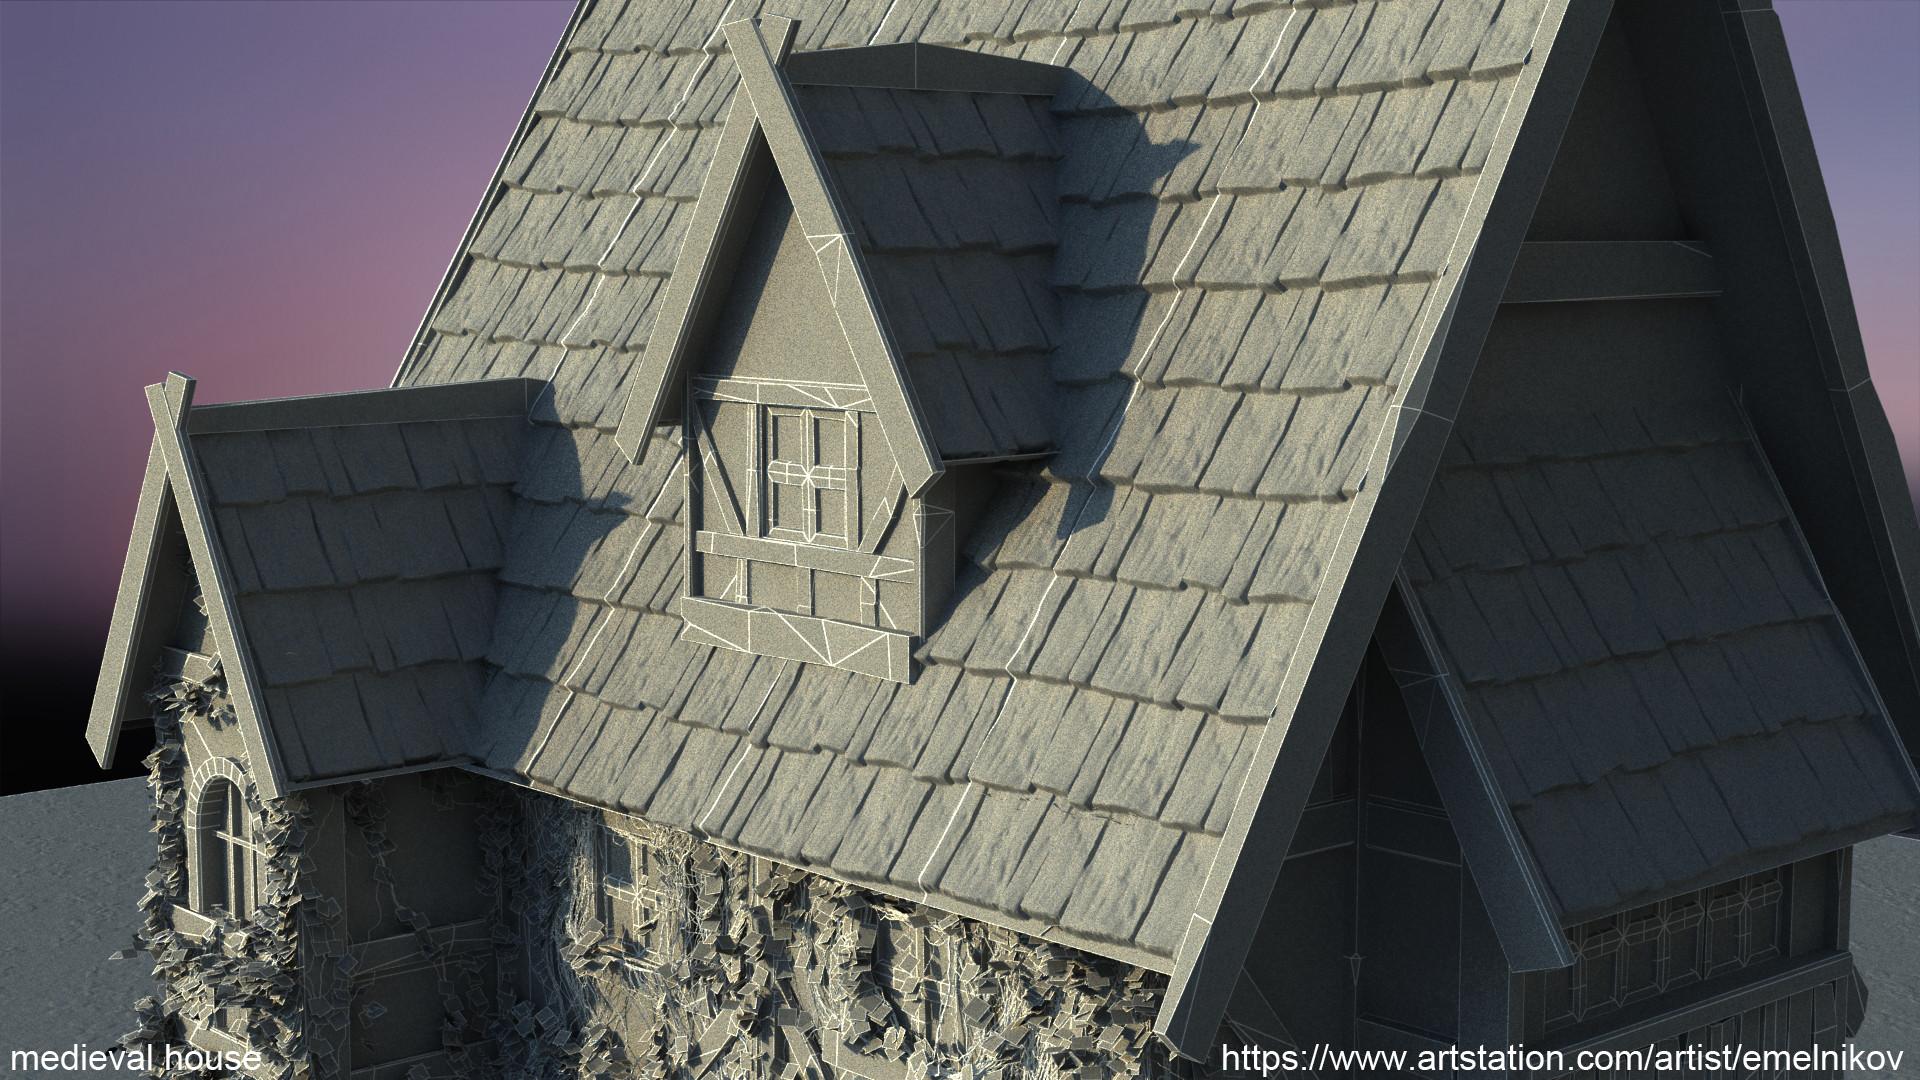 Eugene melnikov medieval house1 render frm10 wire